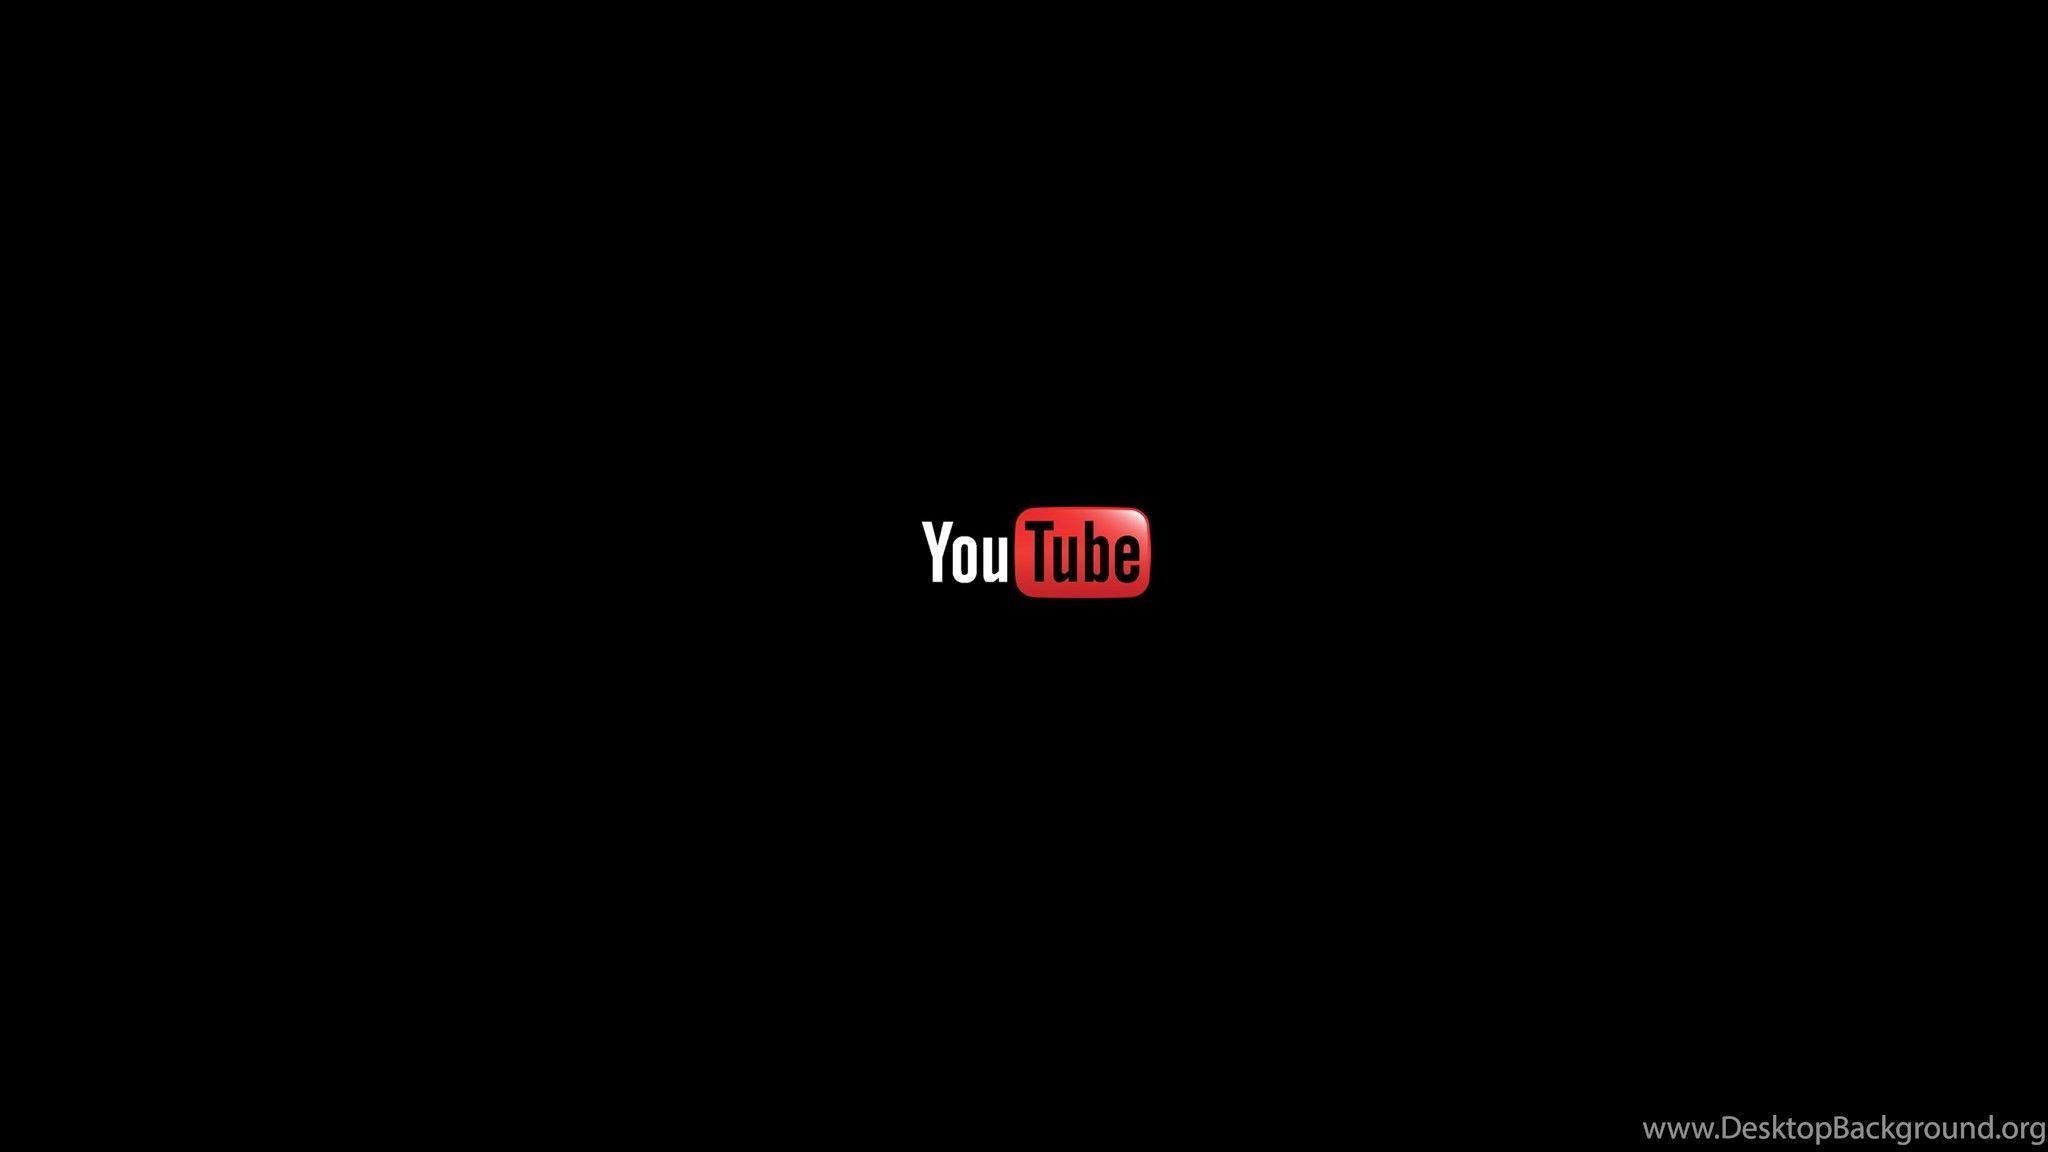 Youtube 2048x1152 Posted By John Mercado